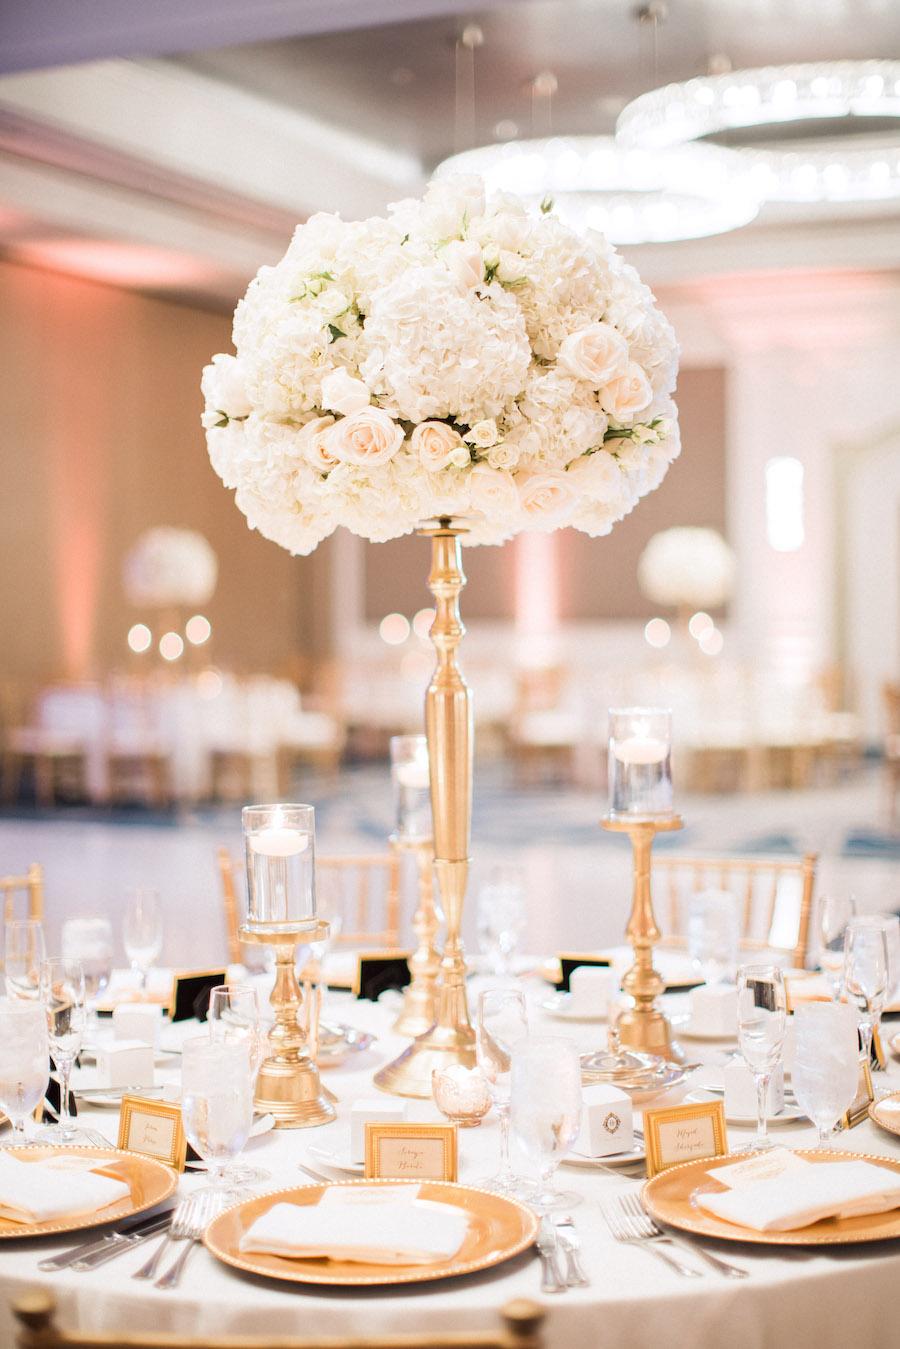 Tall Ivory Rose and Hydrangea Wedding Centerpiece Flowers on Gold Candelabra   Elegant Wedding Reception Decor Inspiration